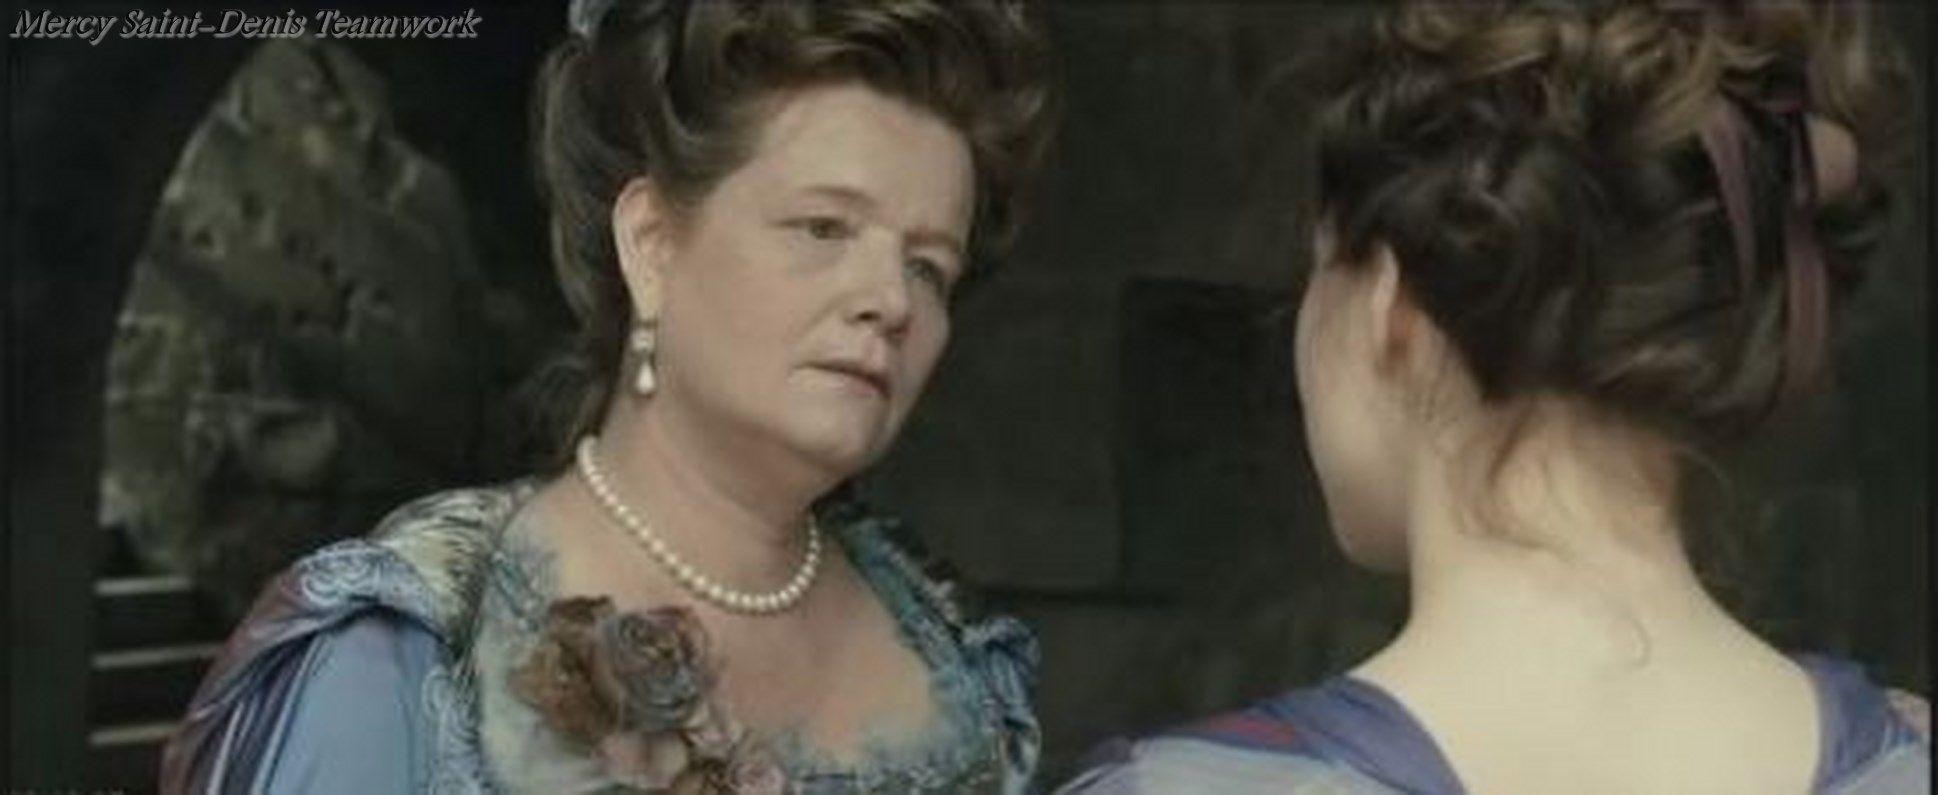 Anne Benoît as Rose Bertin, Les adieux à la reine 2012.